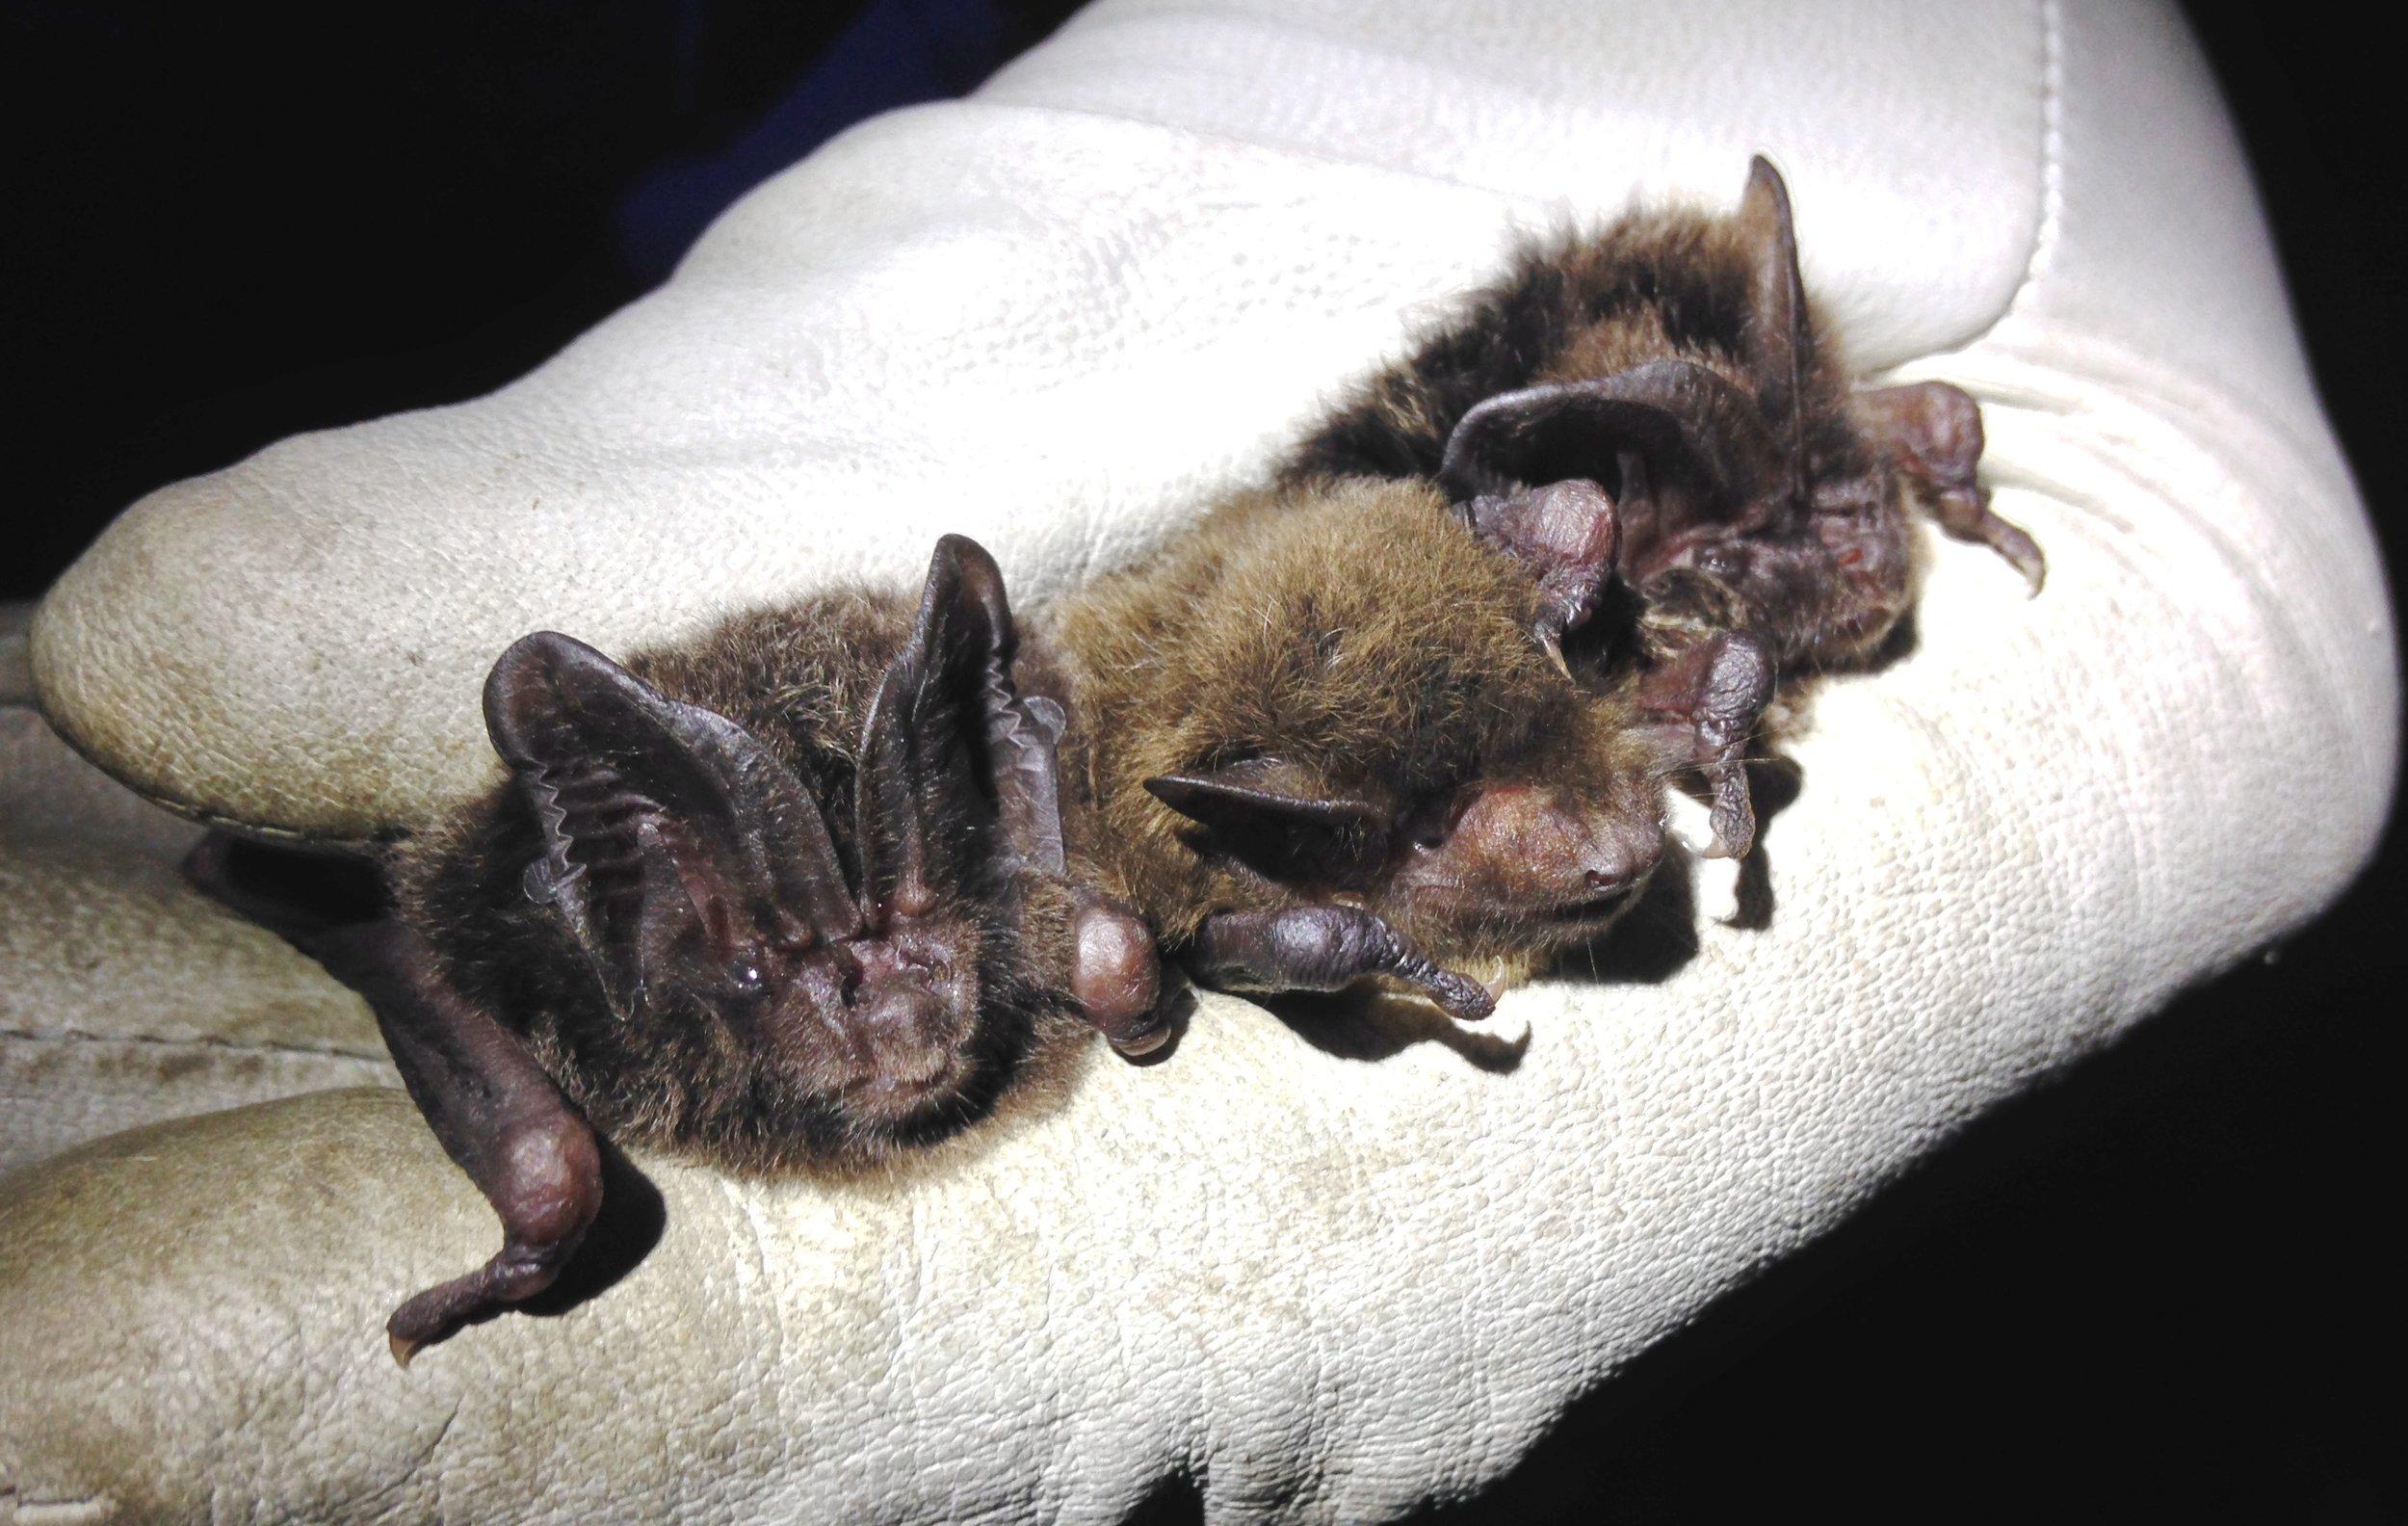 Two barbastelle  Barbastella barbastellus  and a Nathusius' pipistrelle  Pipistrellus nathusii  caught temporarily on an advanced licence bat survey (photo by Matt Cook)